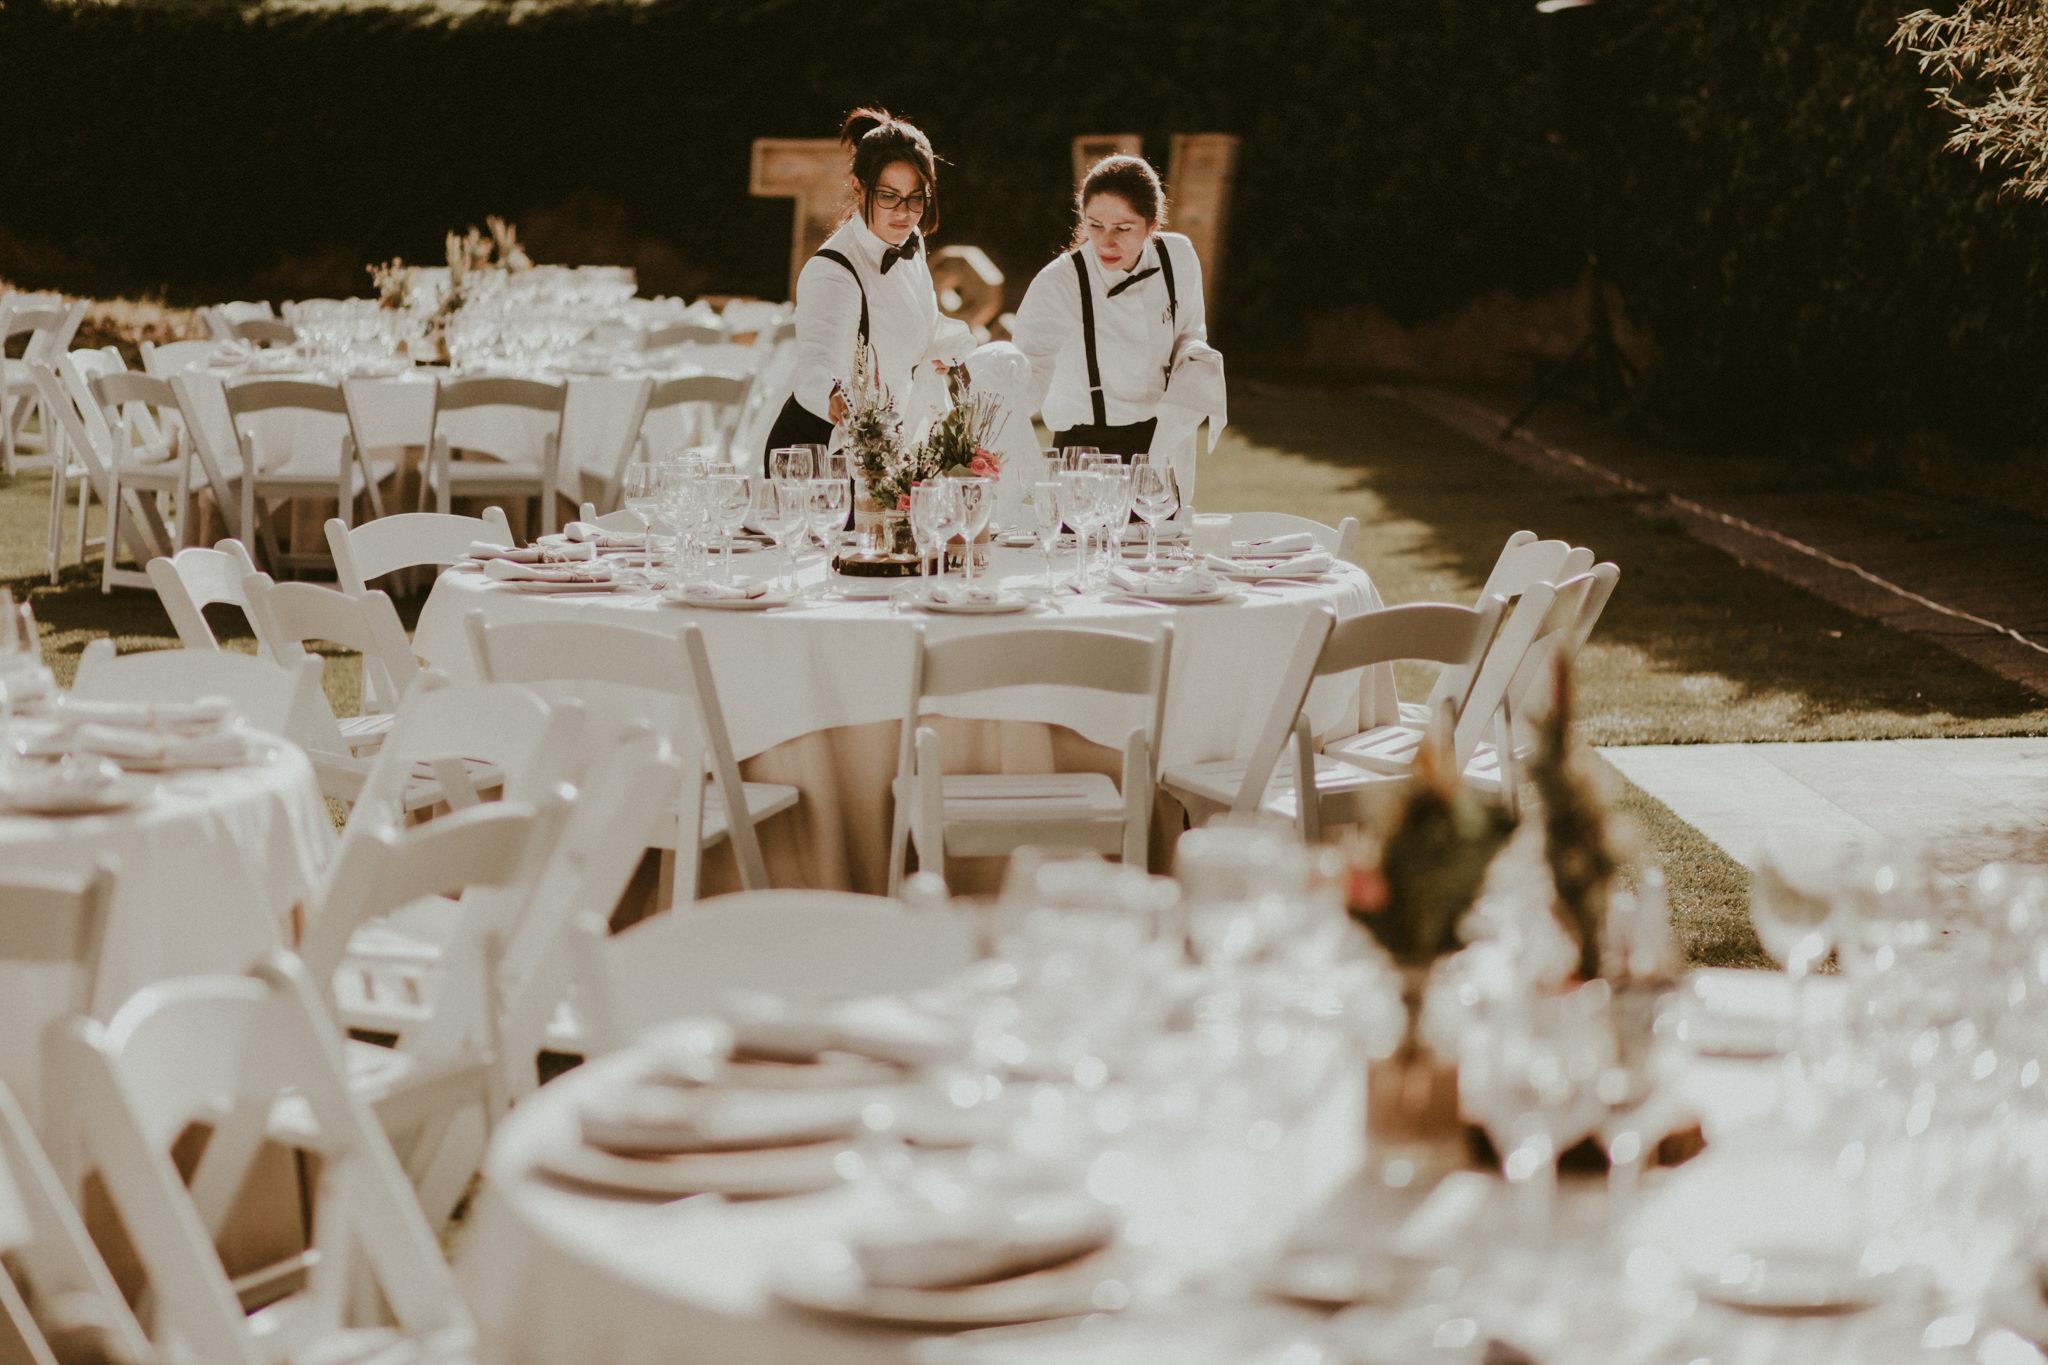 boda-diferente-fotografo-boda-laspalmas-grancanaria-54